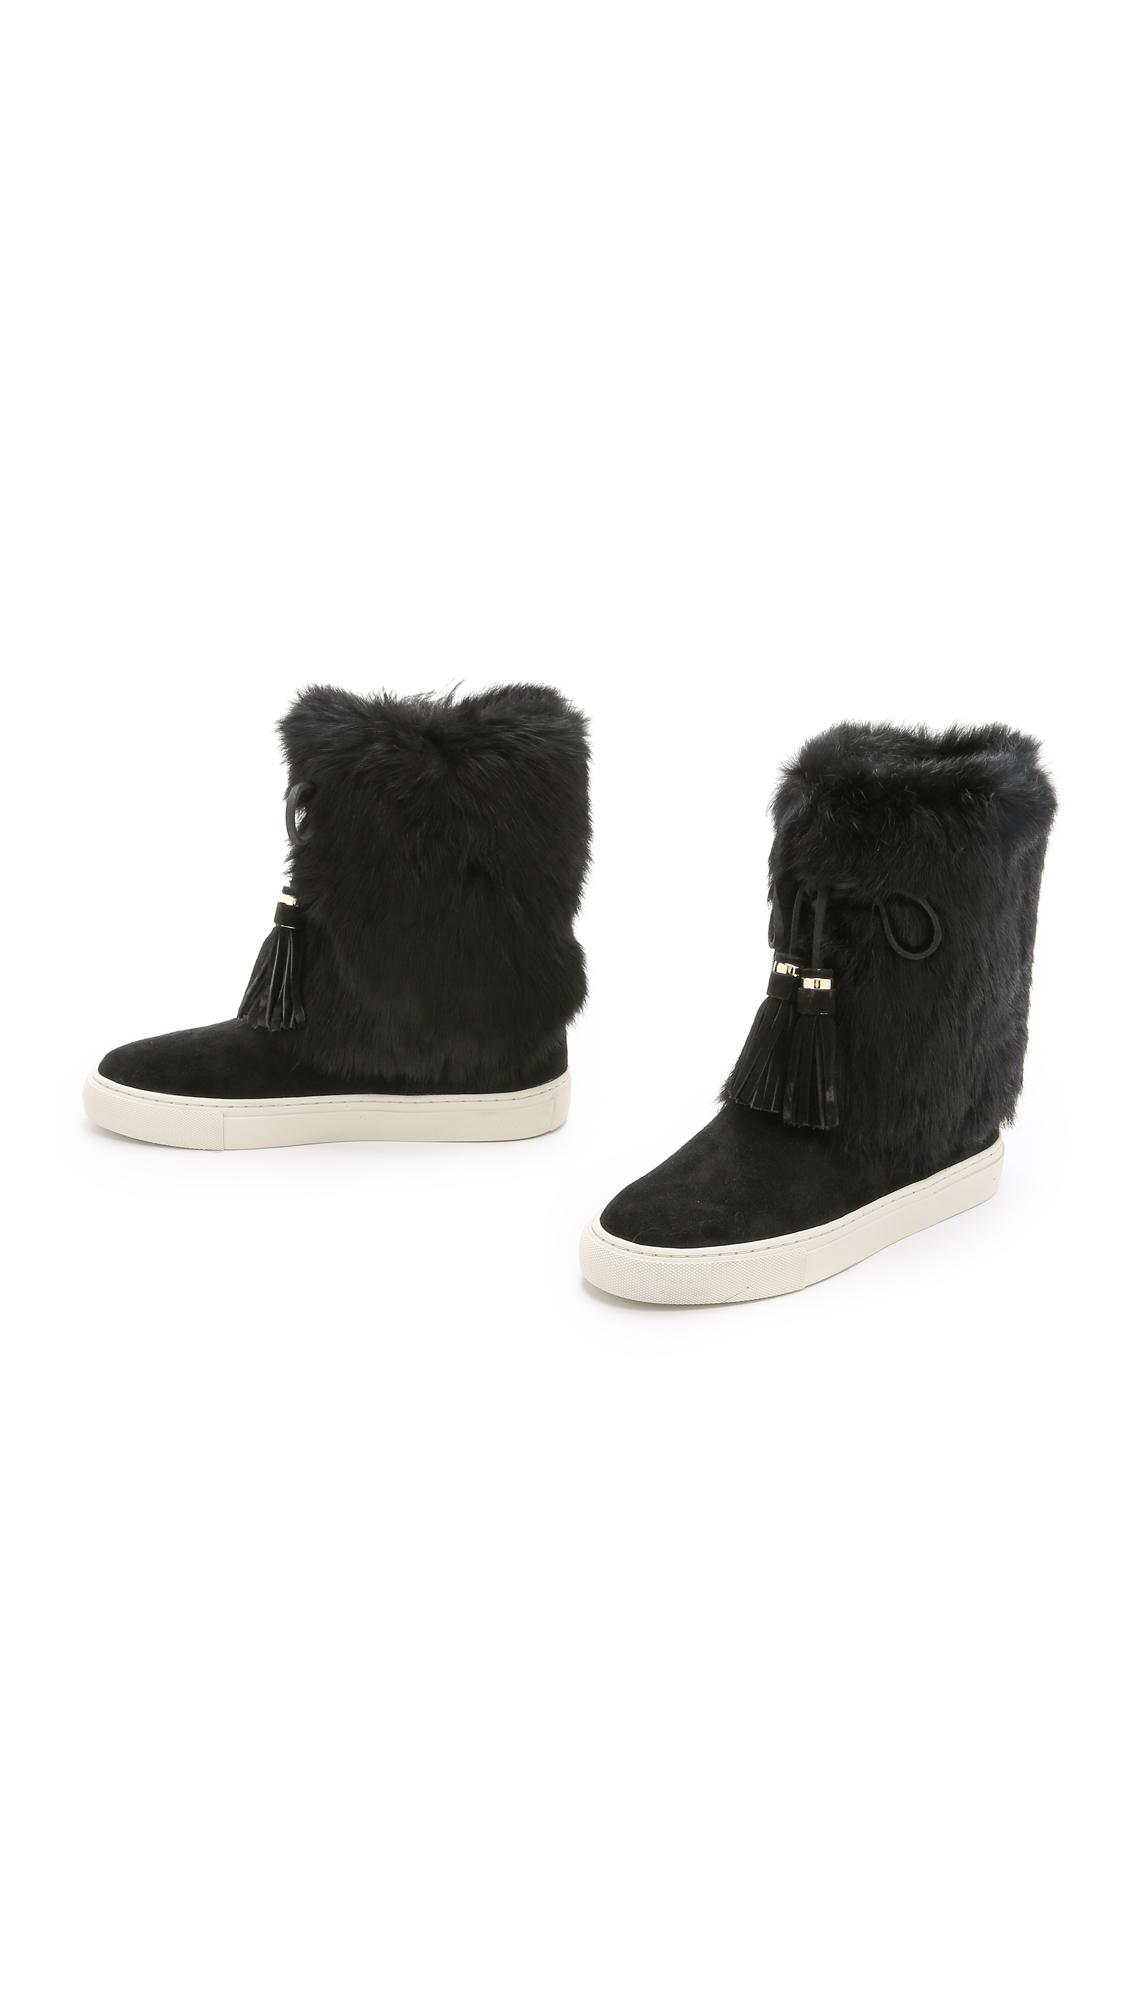 burch anjelica suede fur boots in black lyst